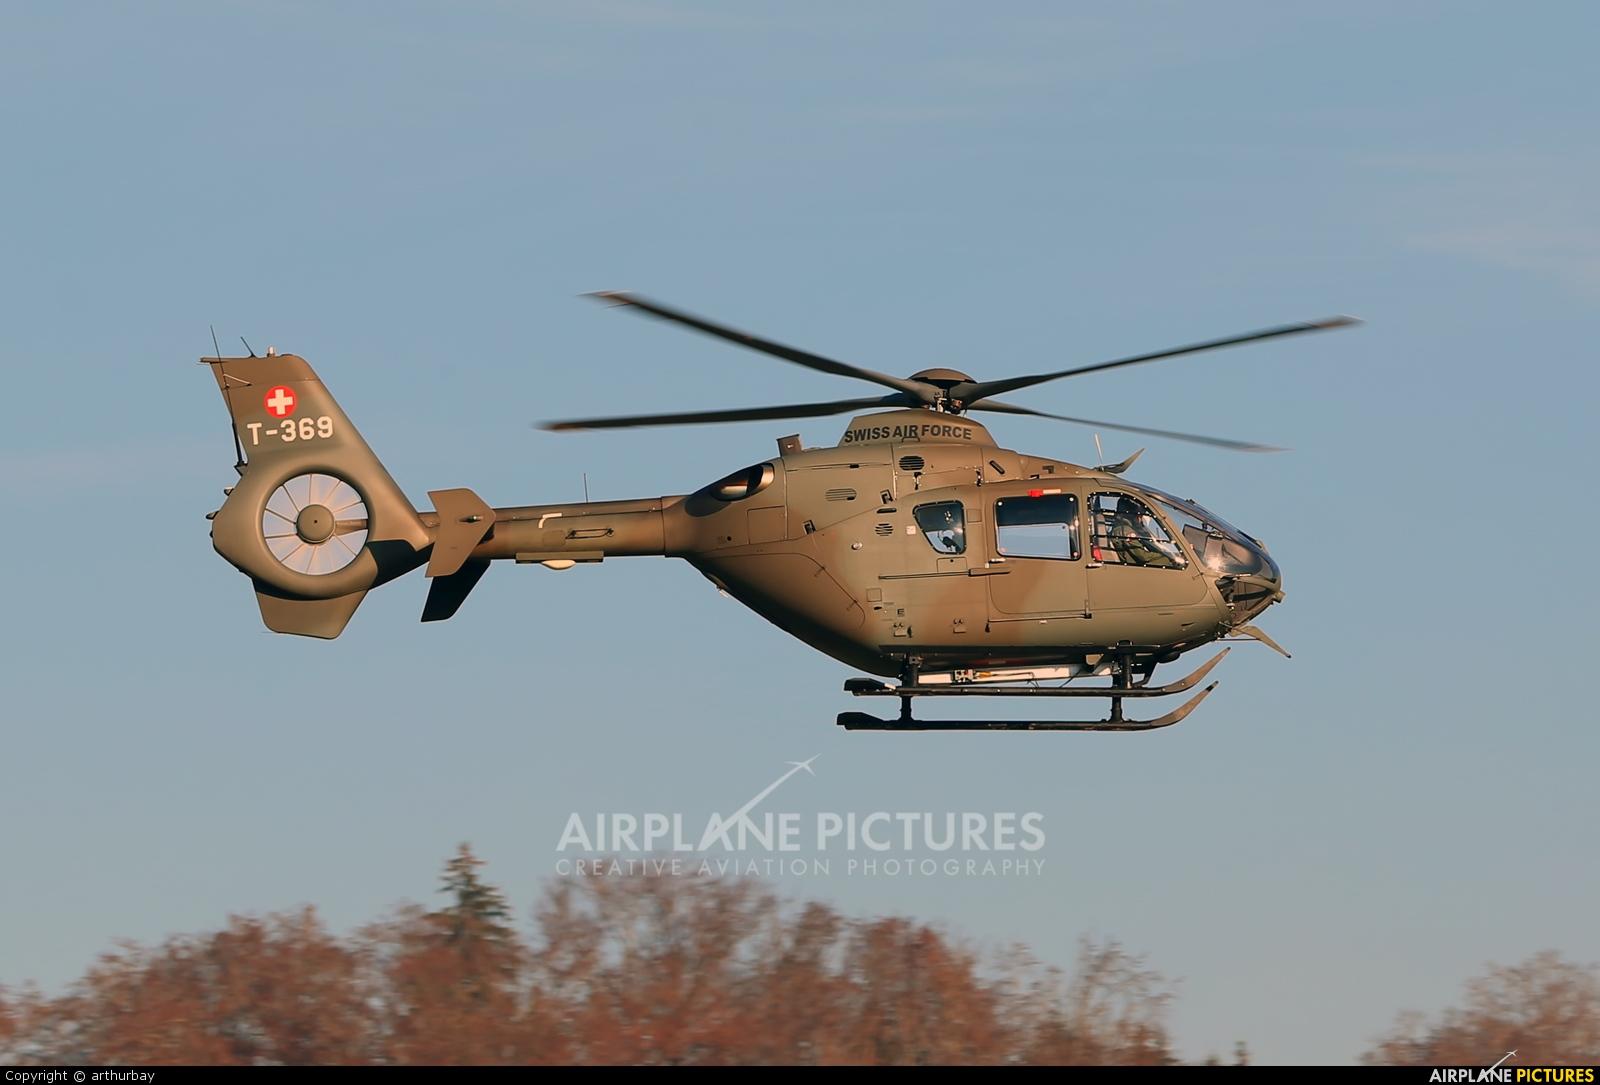 Switzerland - Air Force T-369 aircraft at Bern - Belp